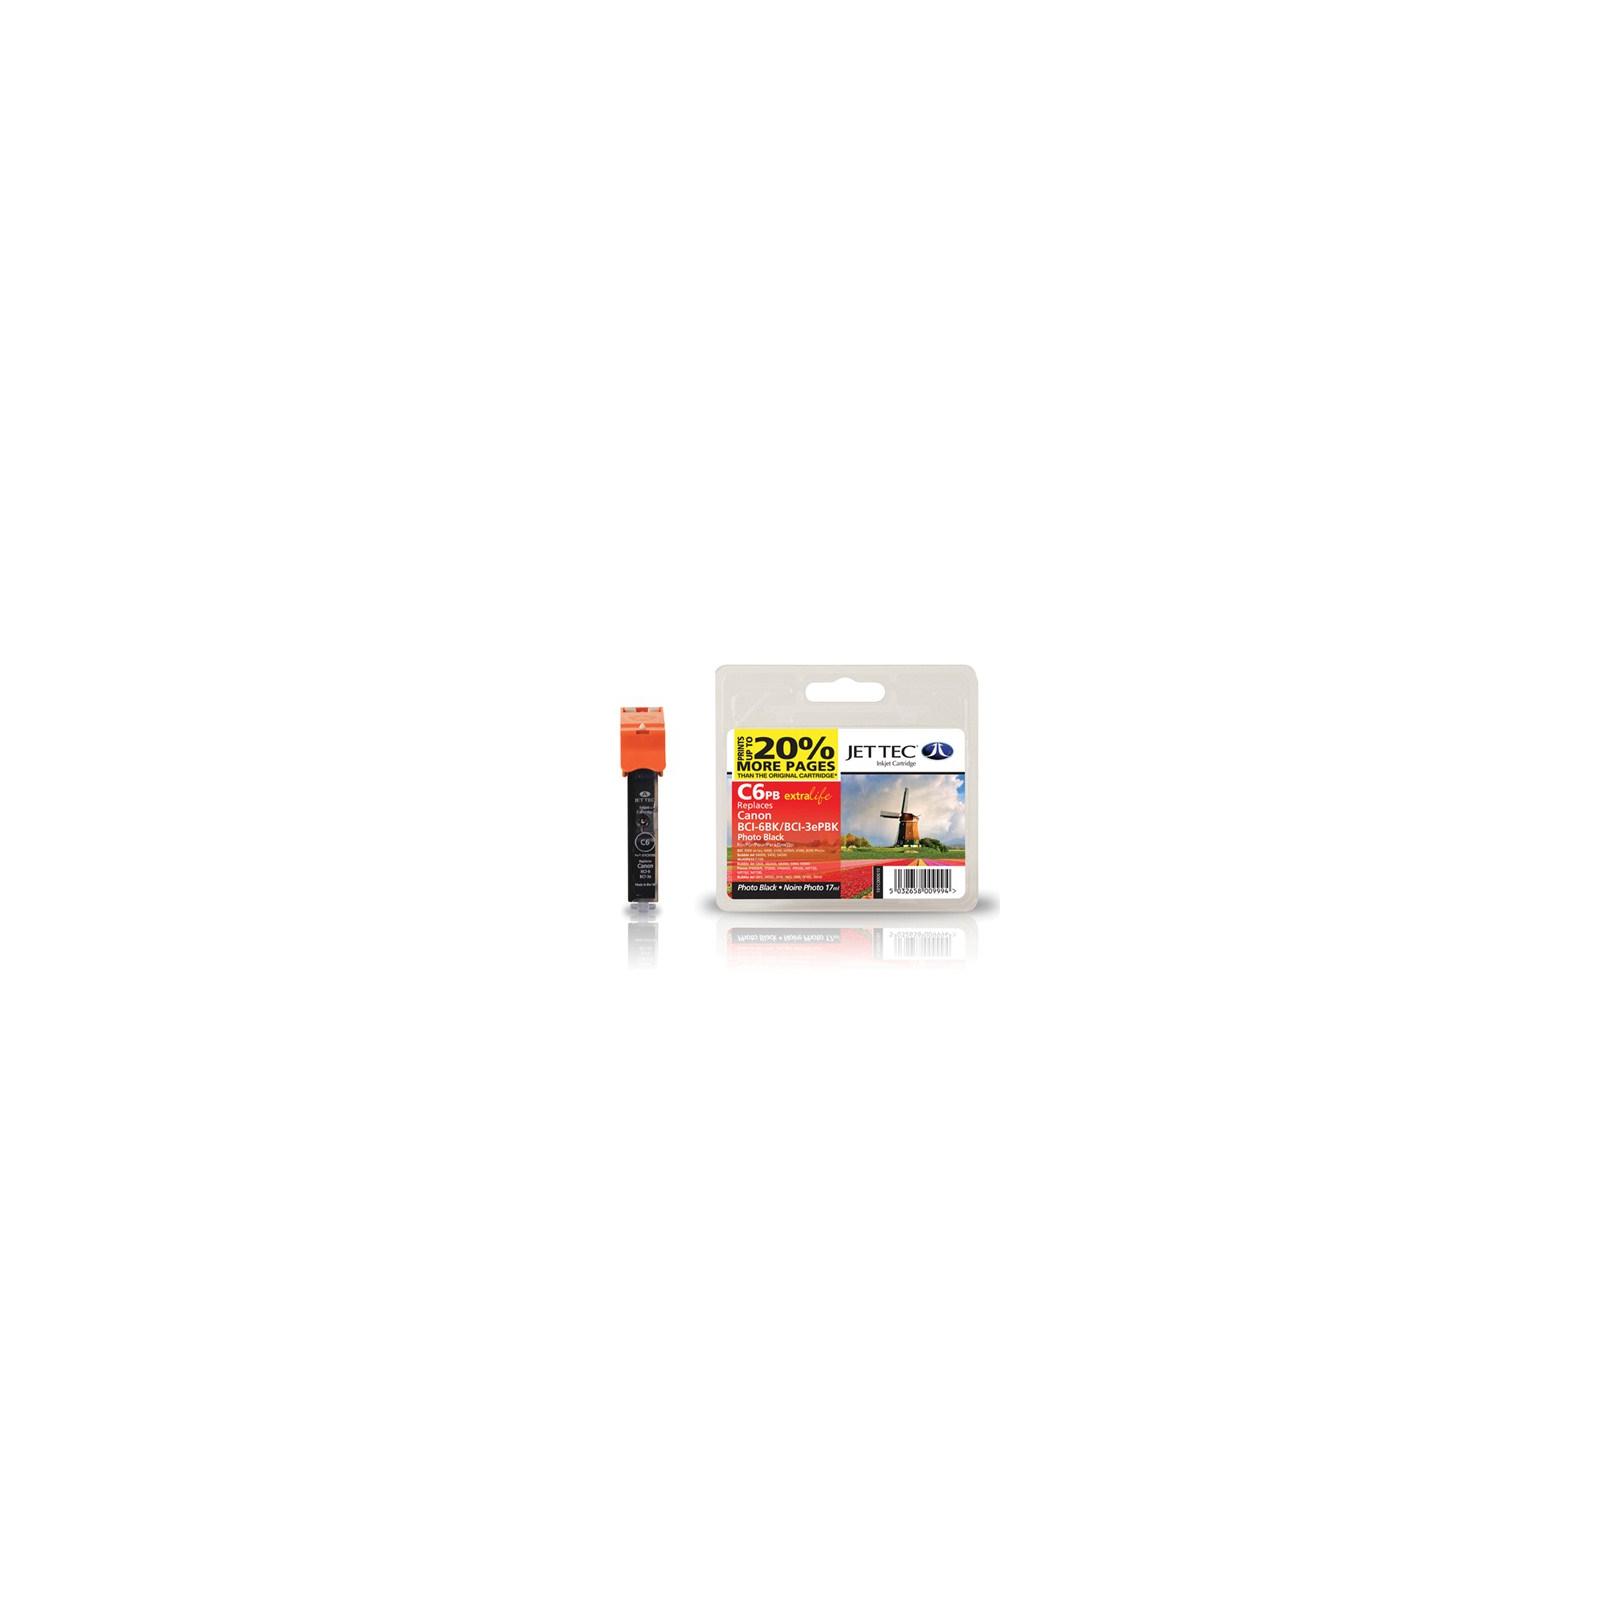 Картридж Jet Tec CANON BCI-3 PhotoBlack/BCI-6 Black (110C000610)